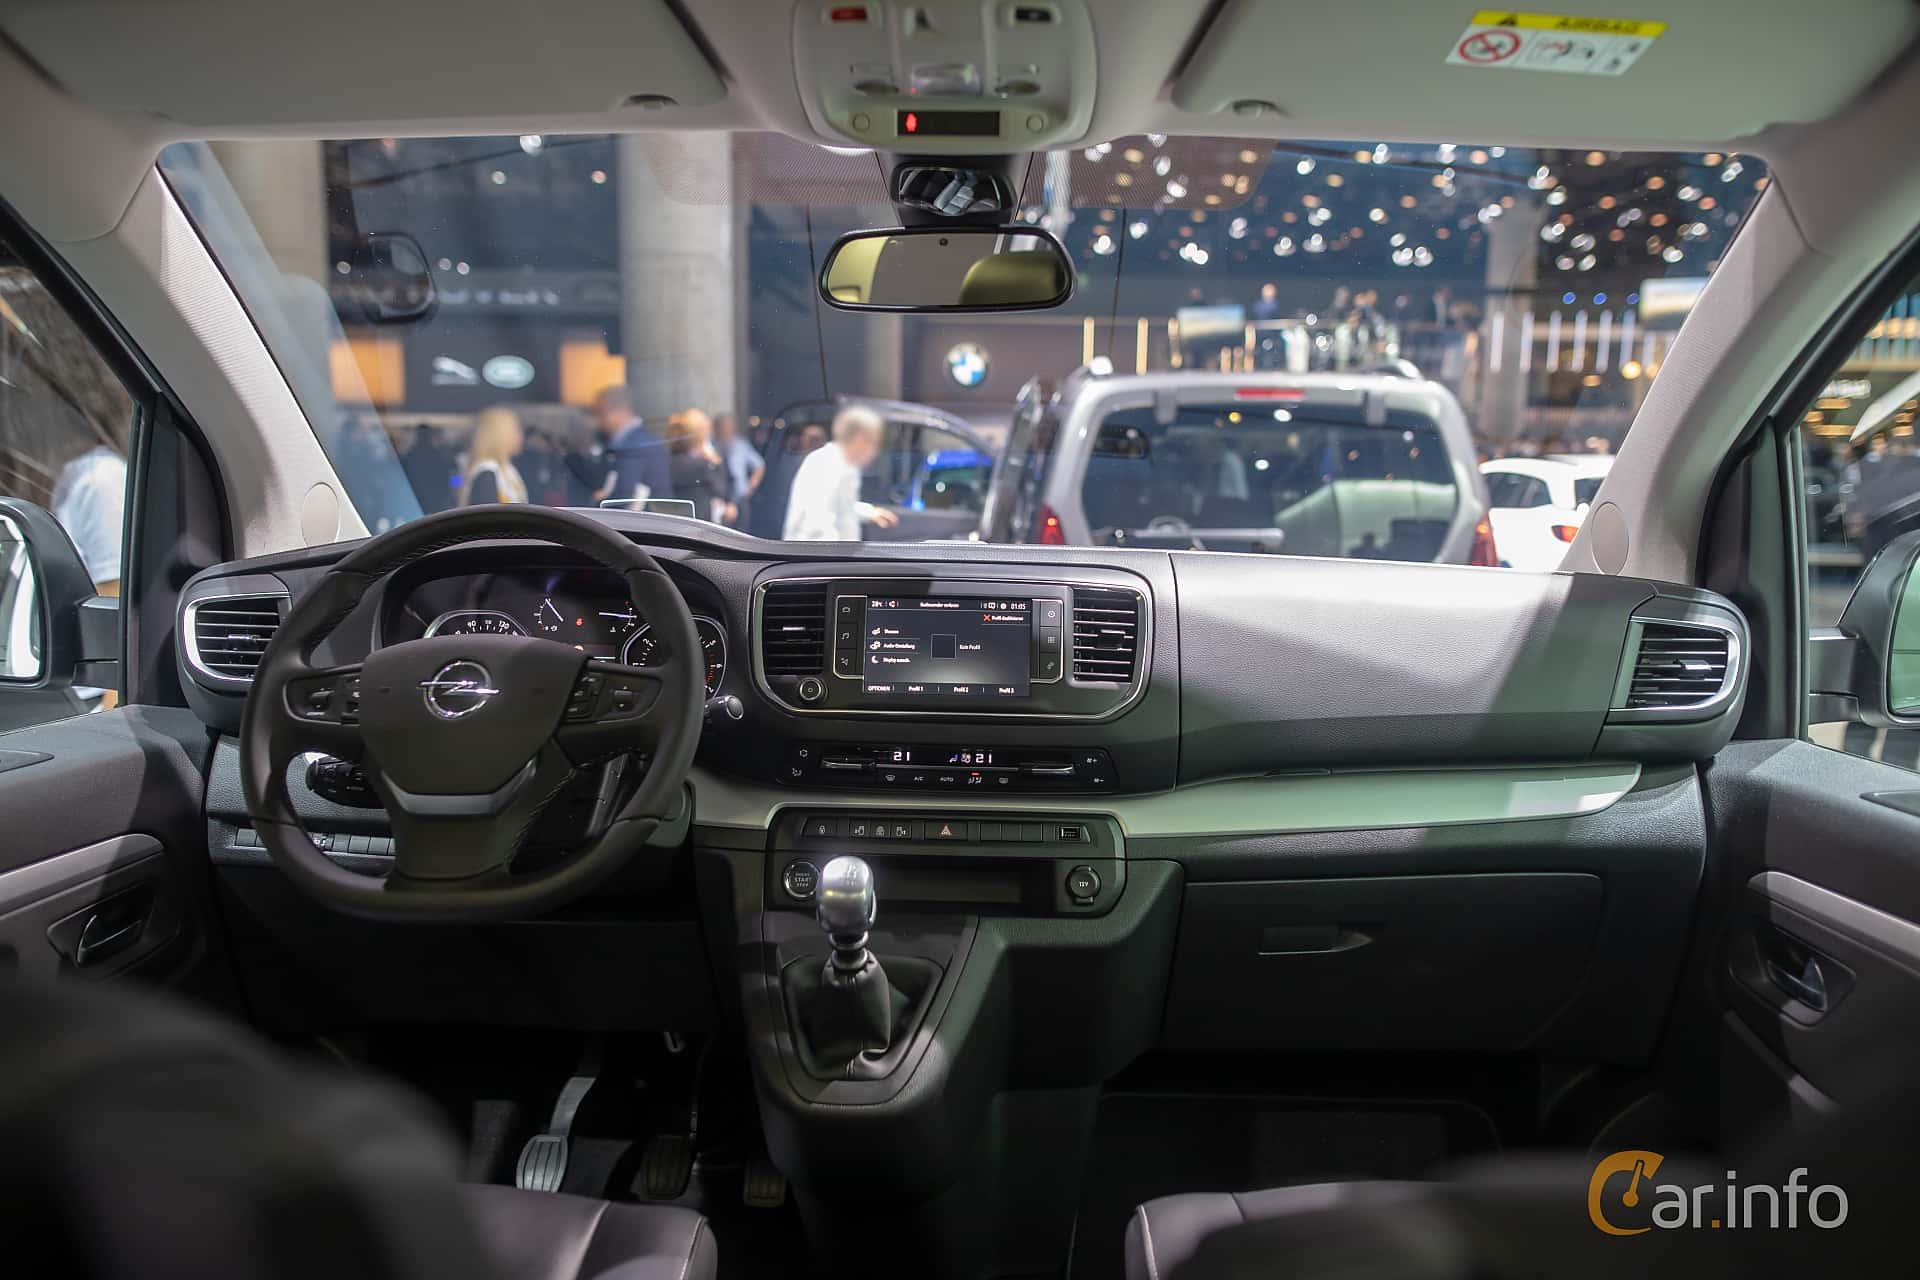 Opel Zafira Life 2.0 Manual, 150hp, 2020 at IAA 2019